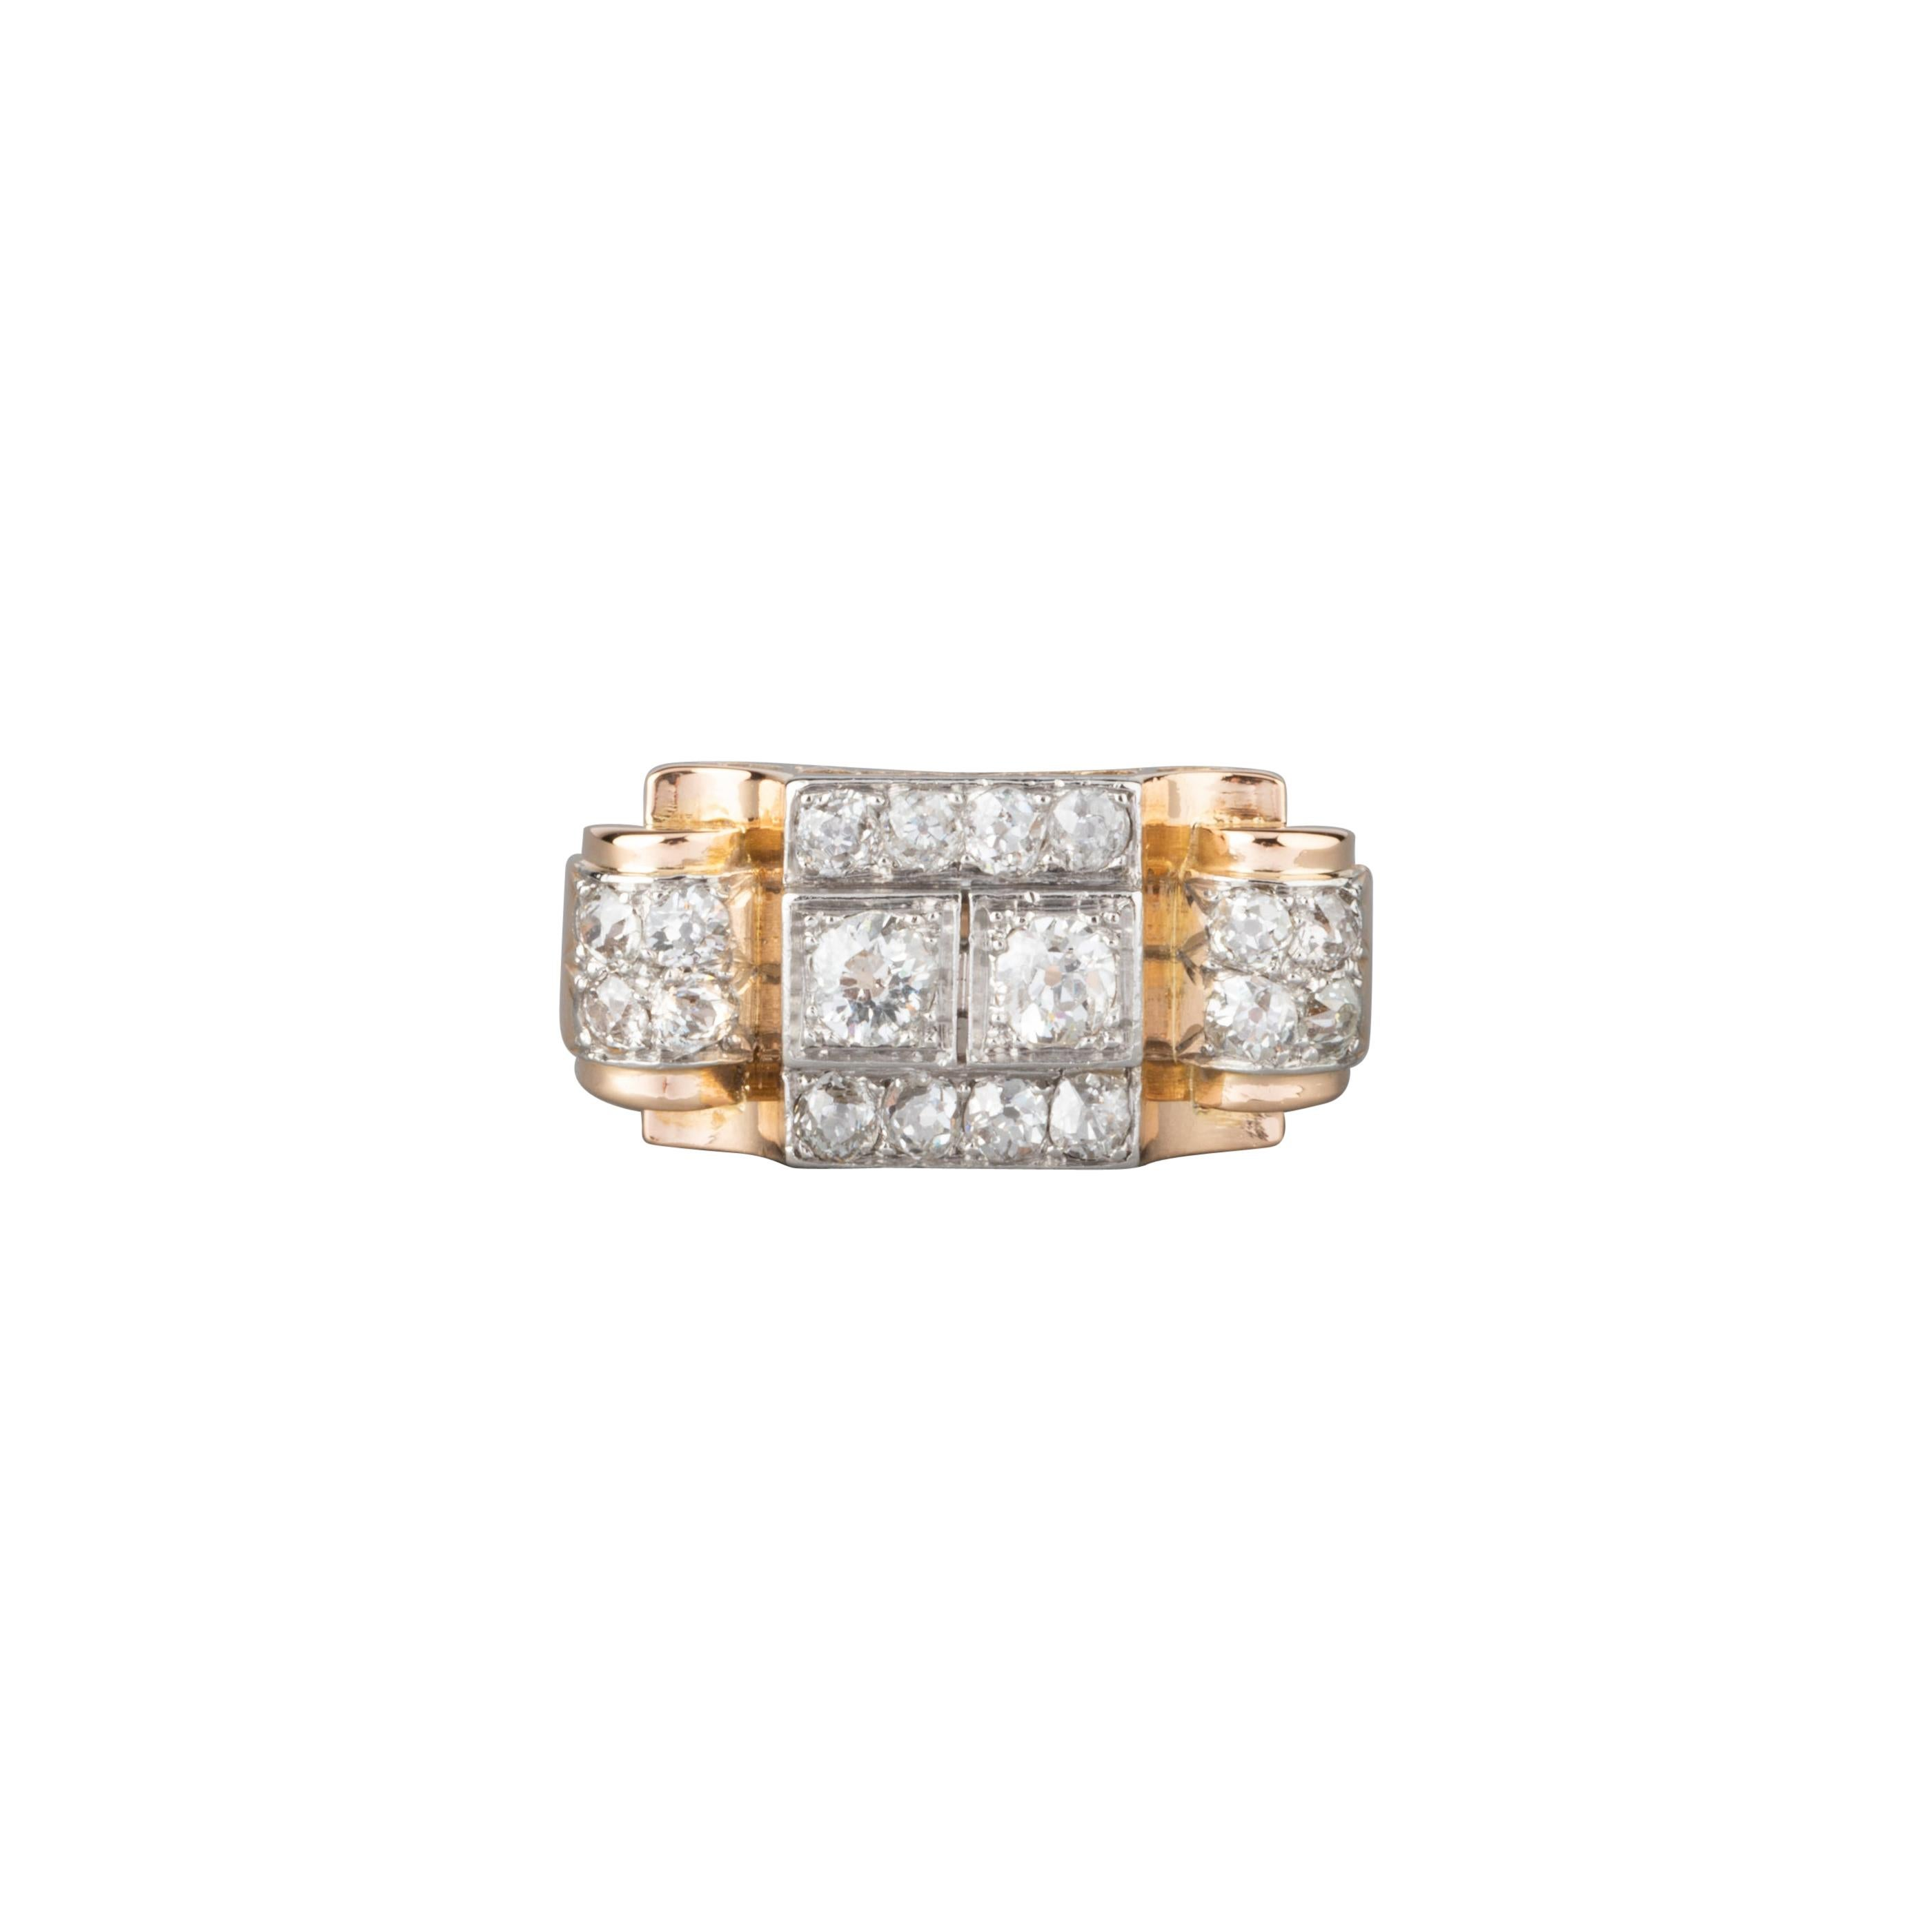 Gold Platinum and 1.20 Carat Diamonds French Tank Ring